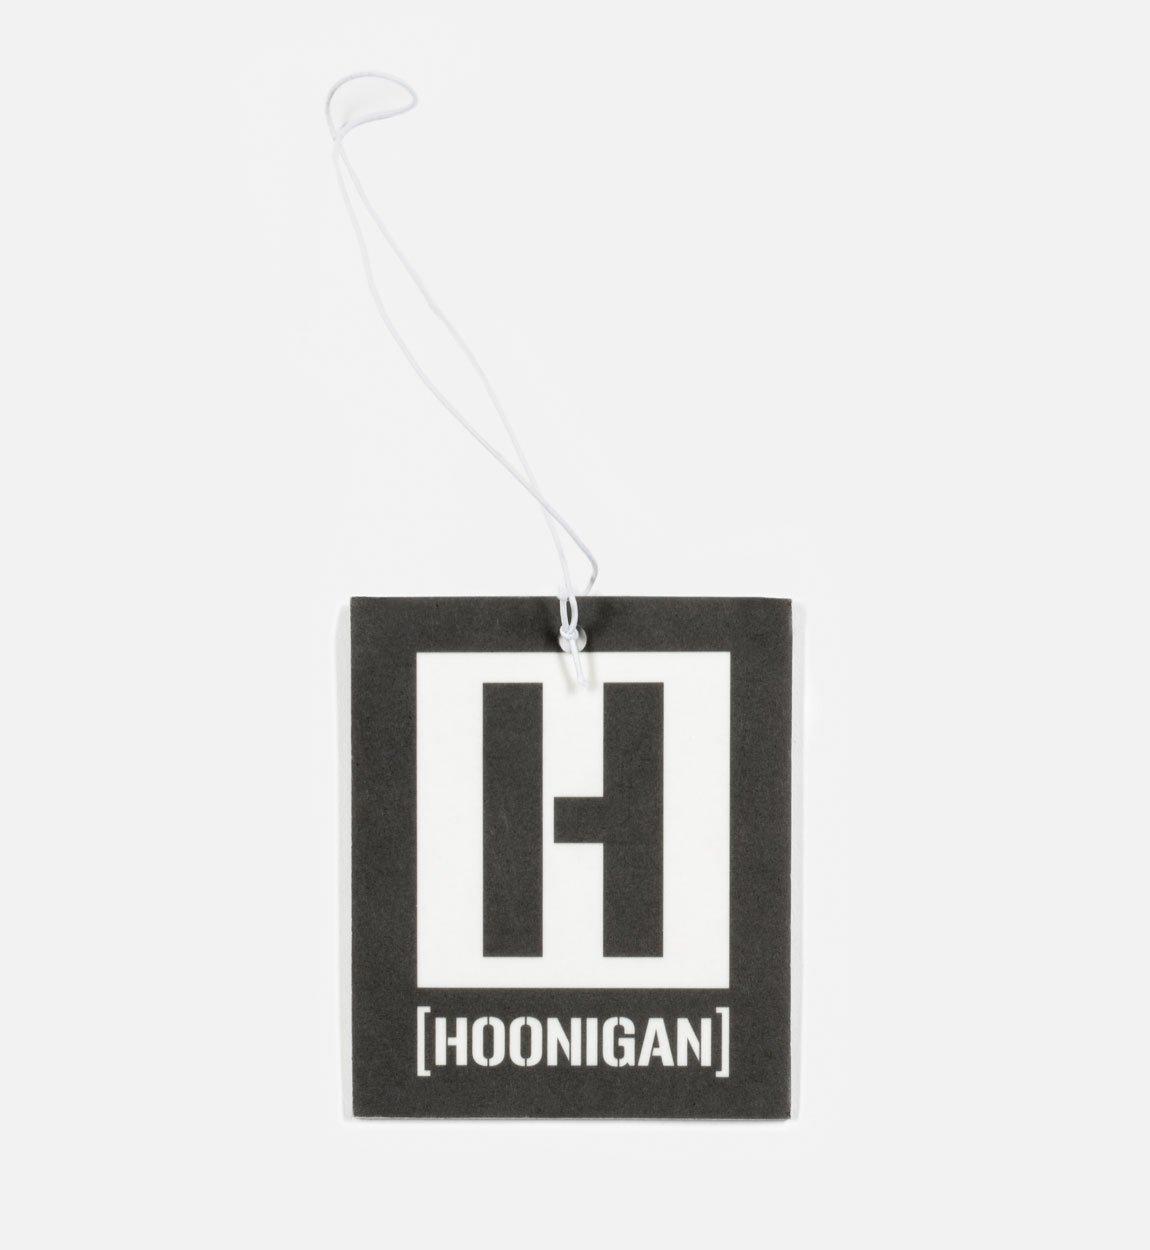 Hoonigan ICON air freshener